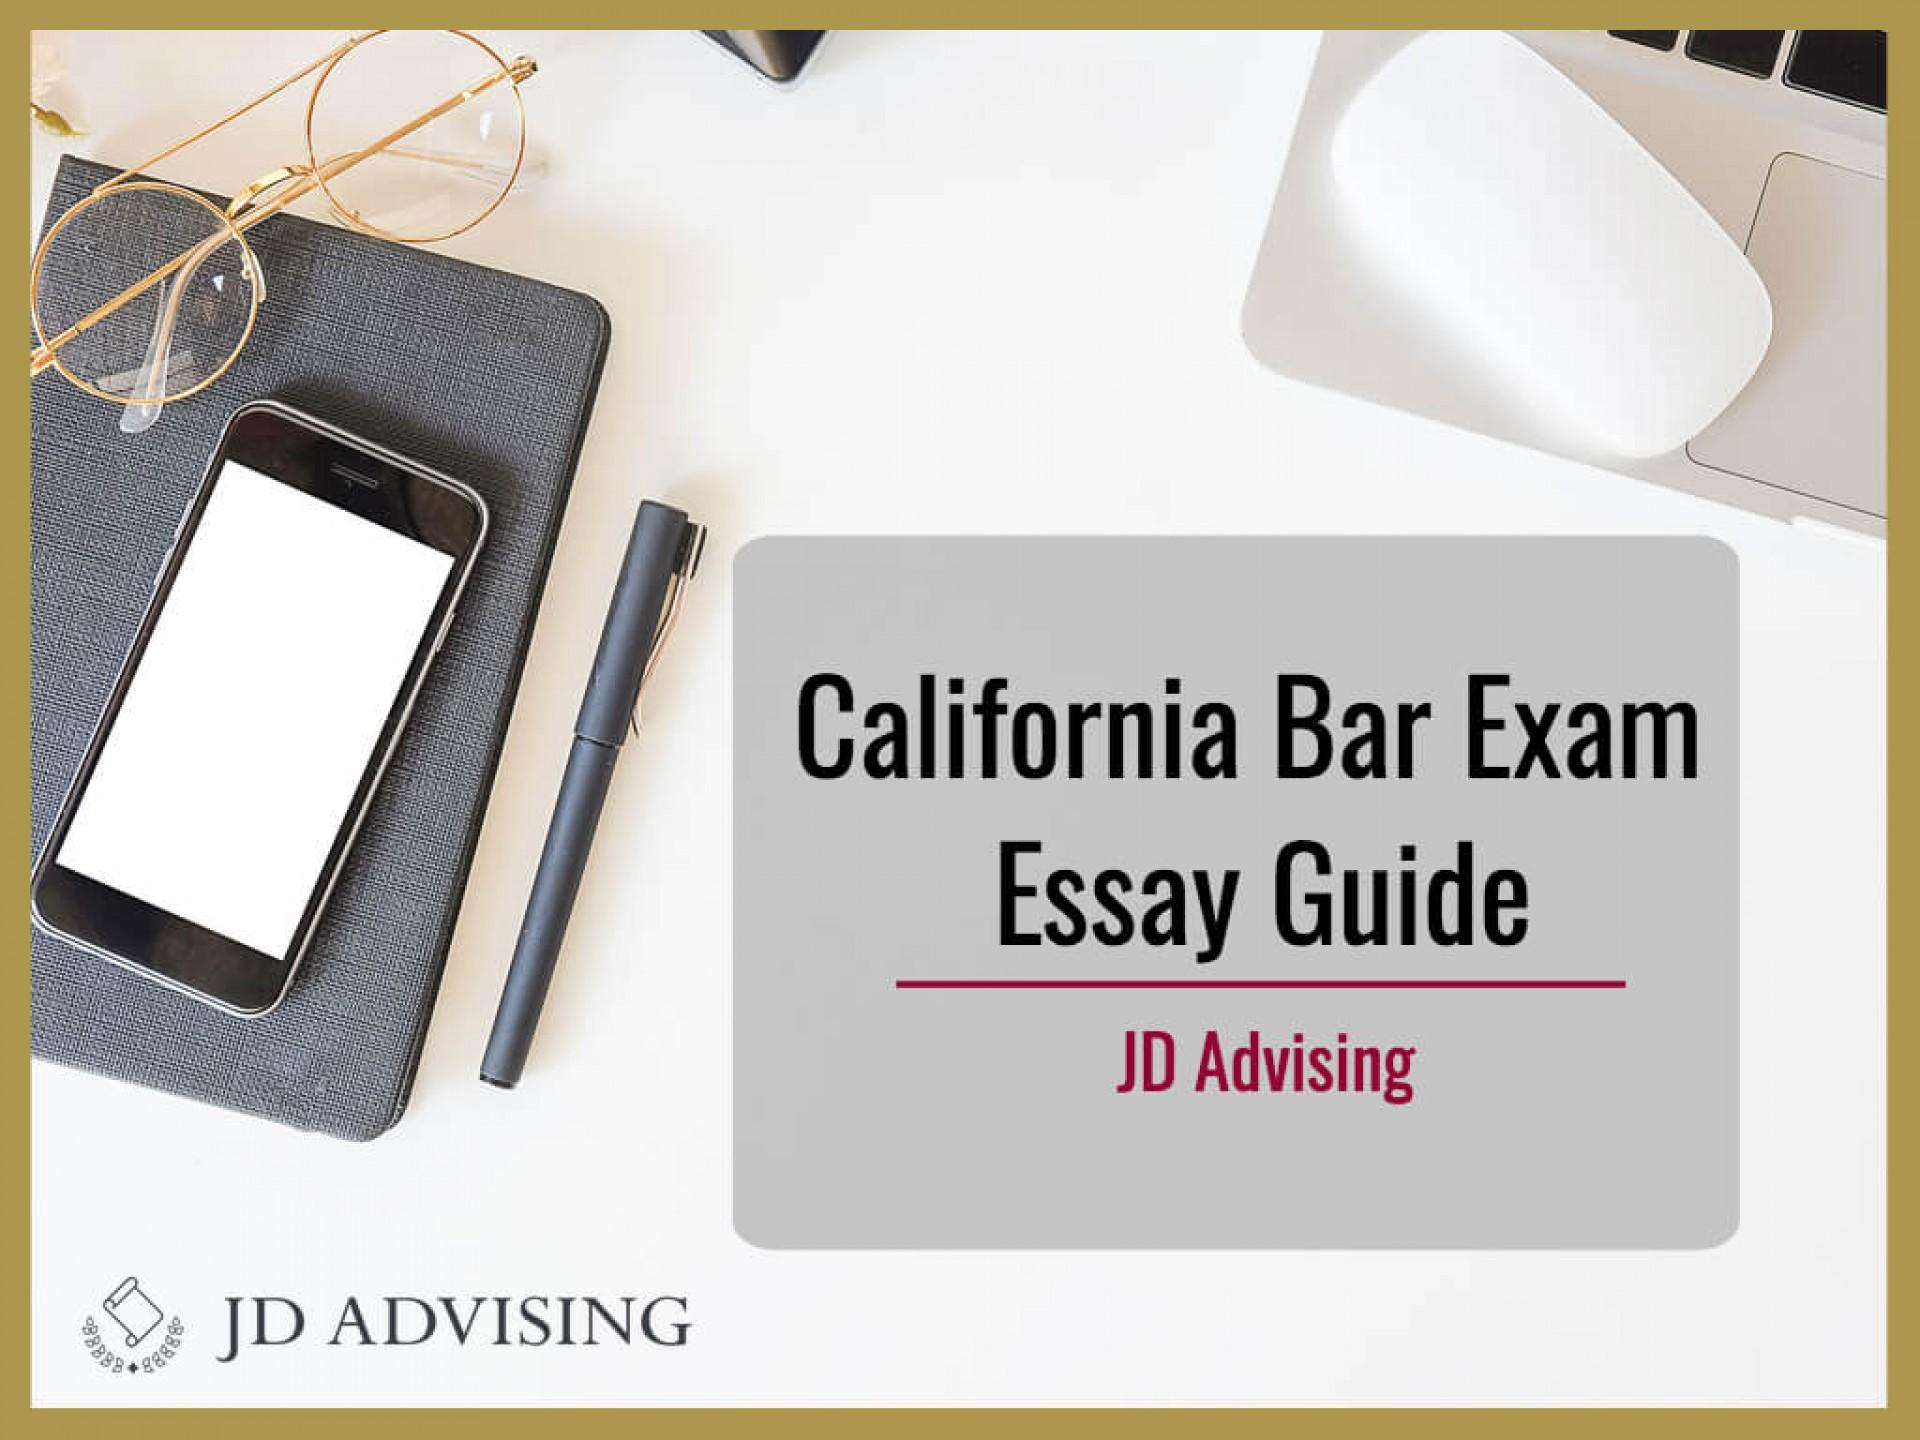 007 Essay Example California Bar Essays Exam Marvelous Graded February 2018 How Are 1920